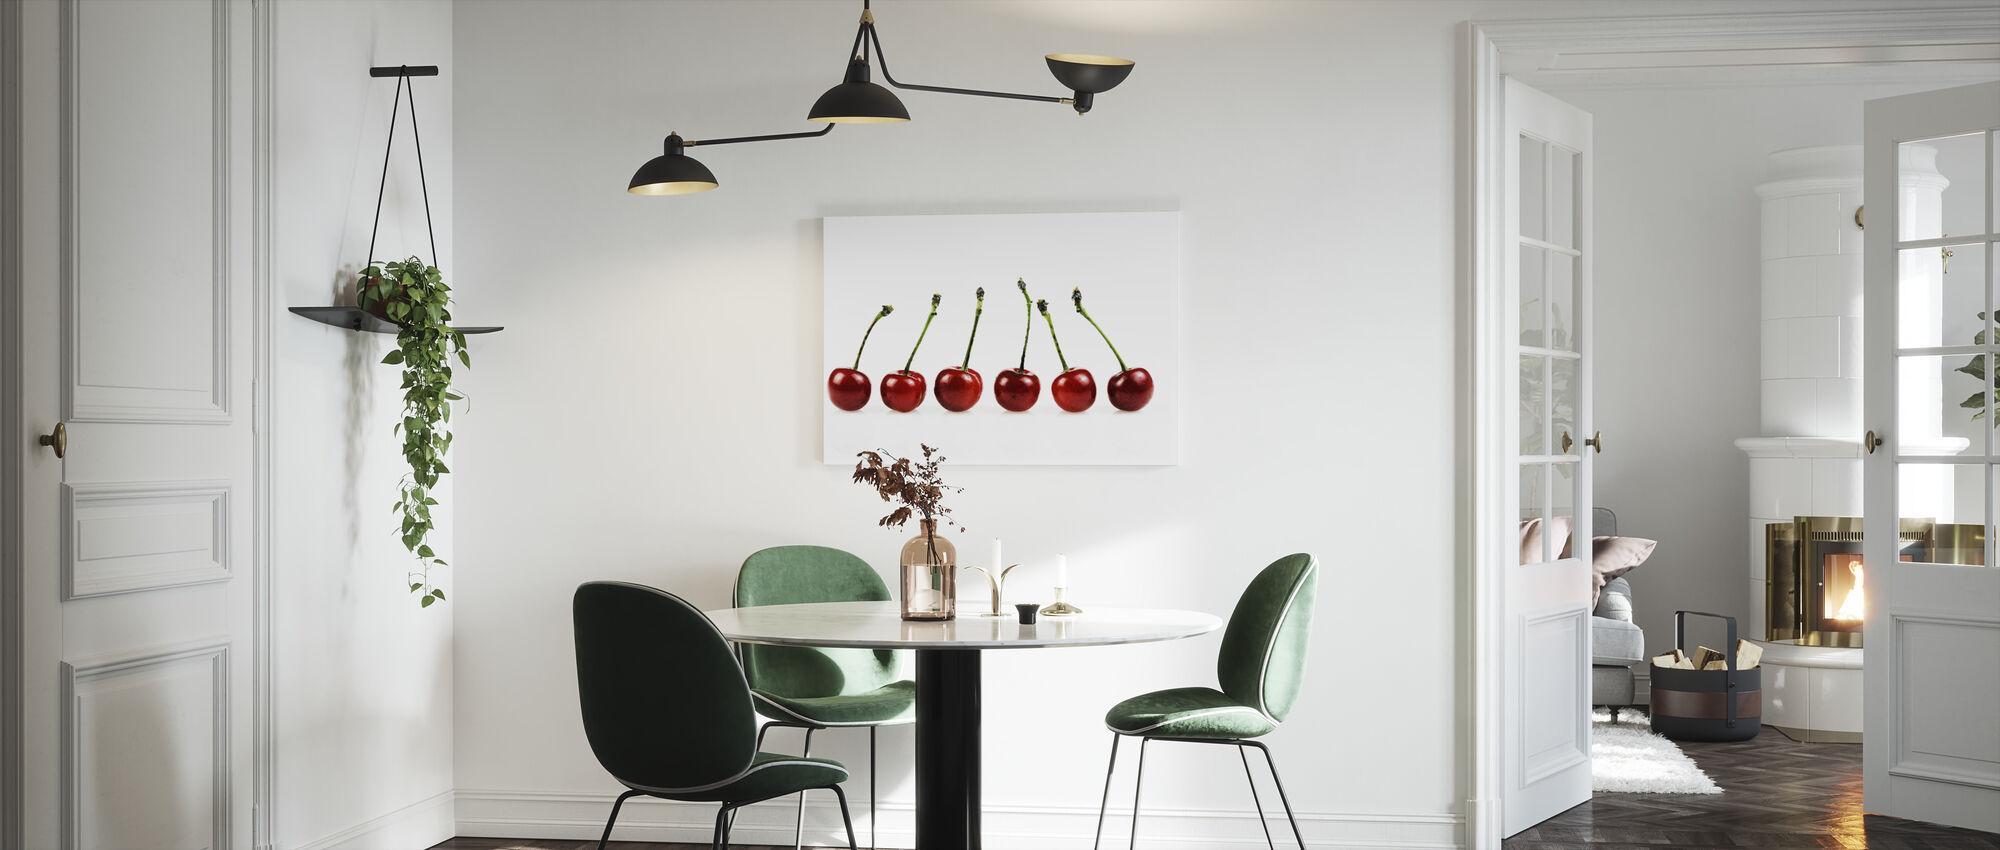 Fresh Cherries - Canvas print - Kitchen